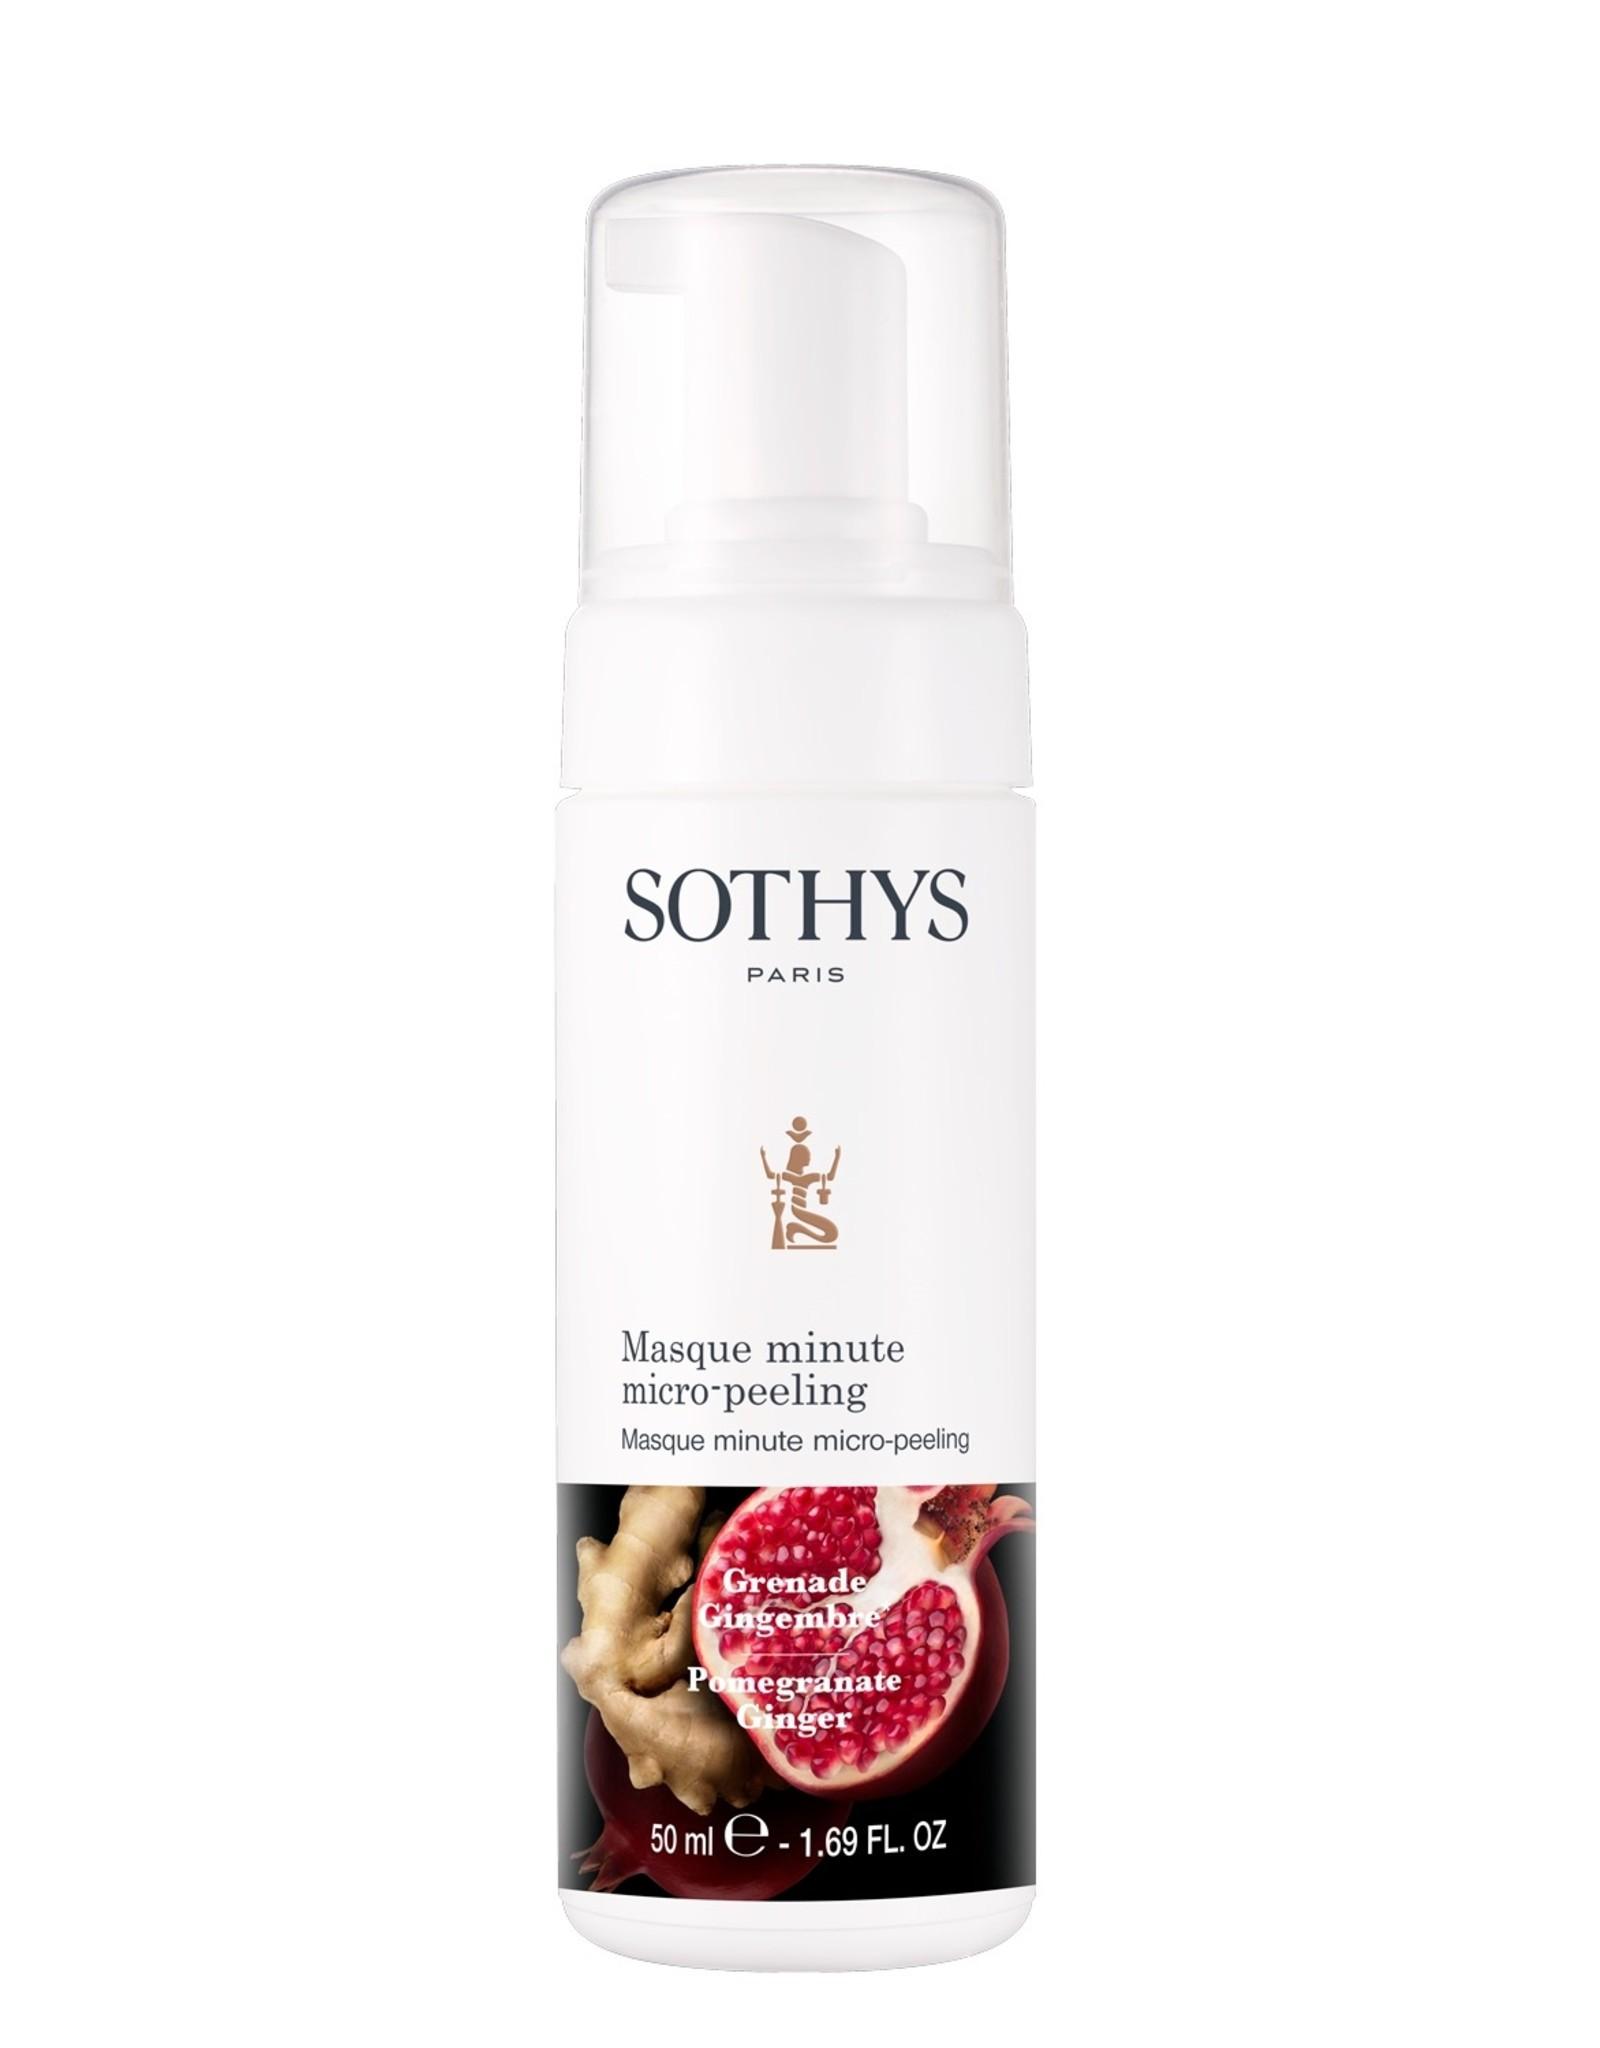 SOTHYS Masque minute micro-peeling - Sothys